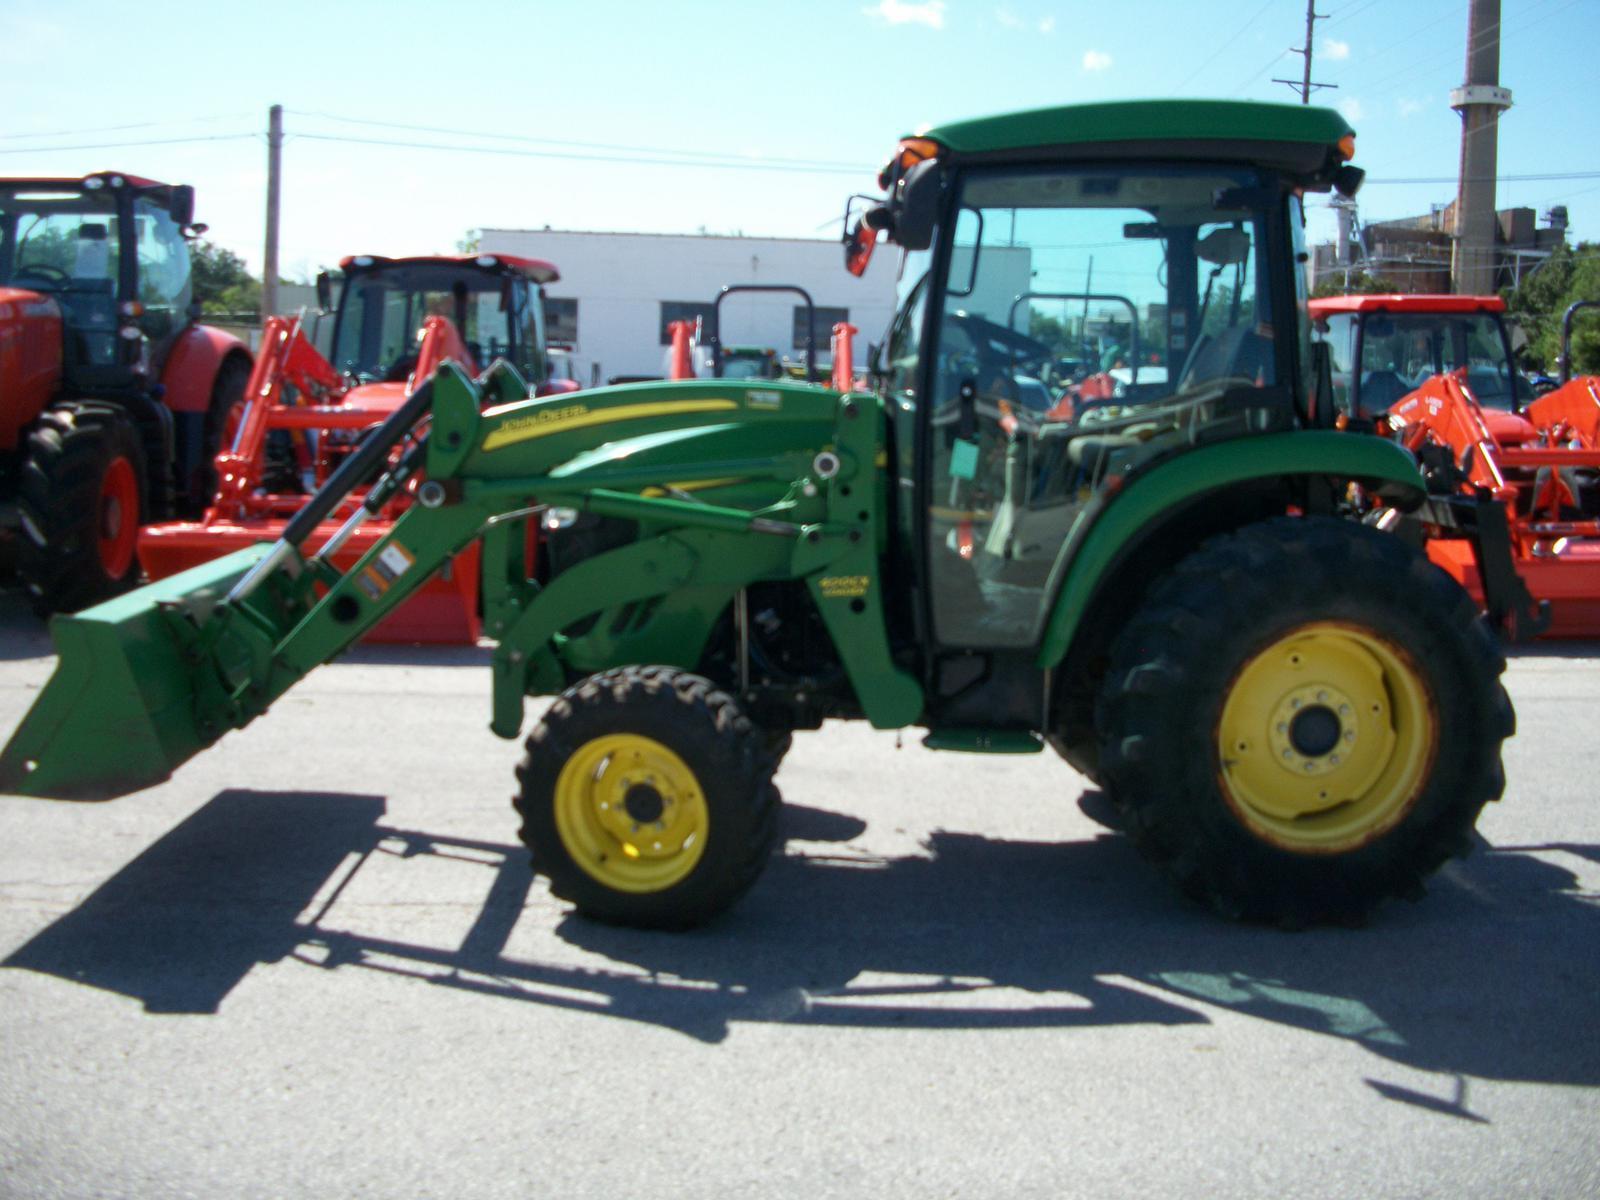 Inventory Farm Power Lawn & Leisure Columbia, MO (573) 442-1139